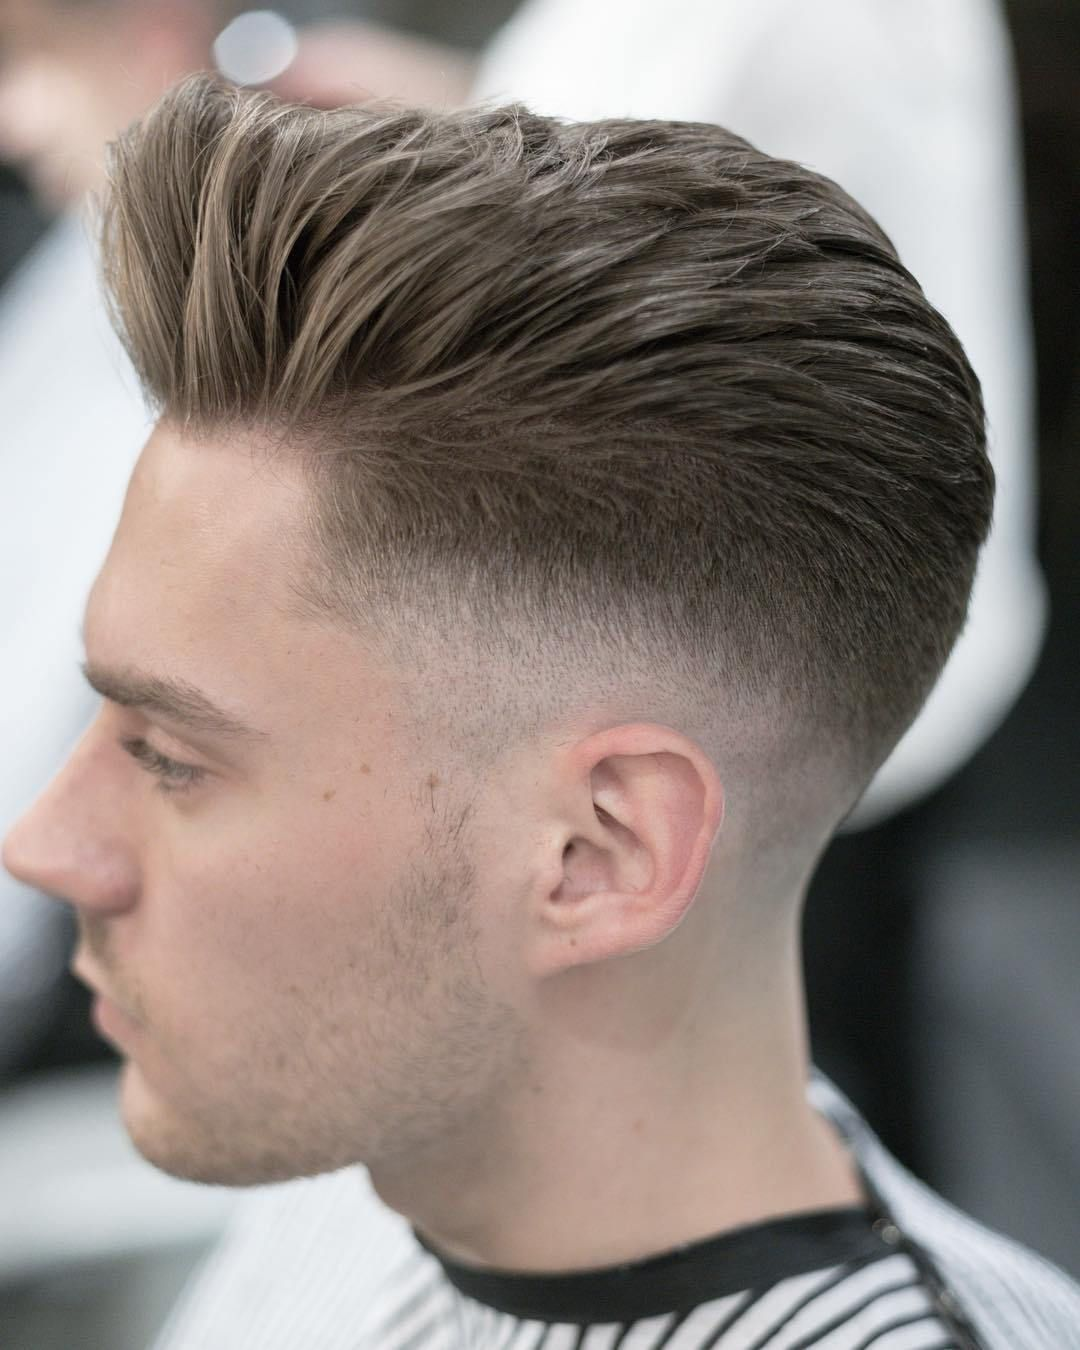 New Degraded Haircuts Man Short Hair 2019 Winter Pompadour Haircut Haircuts For Men Mens Hairstyles Pompadour